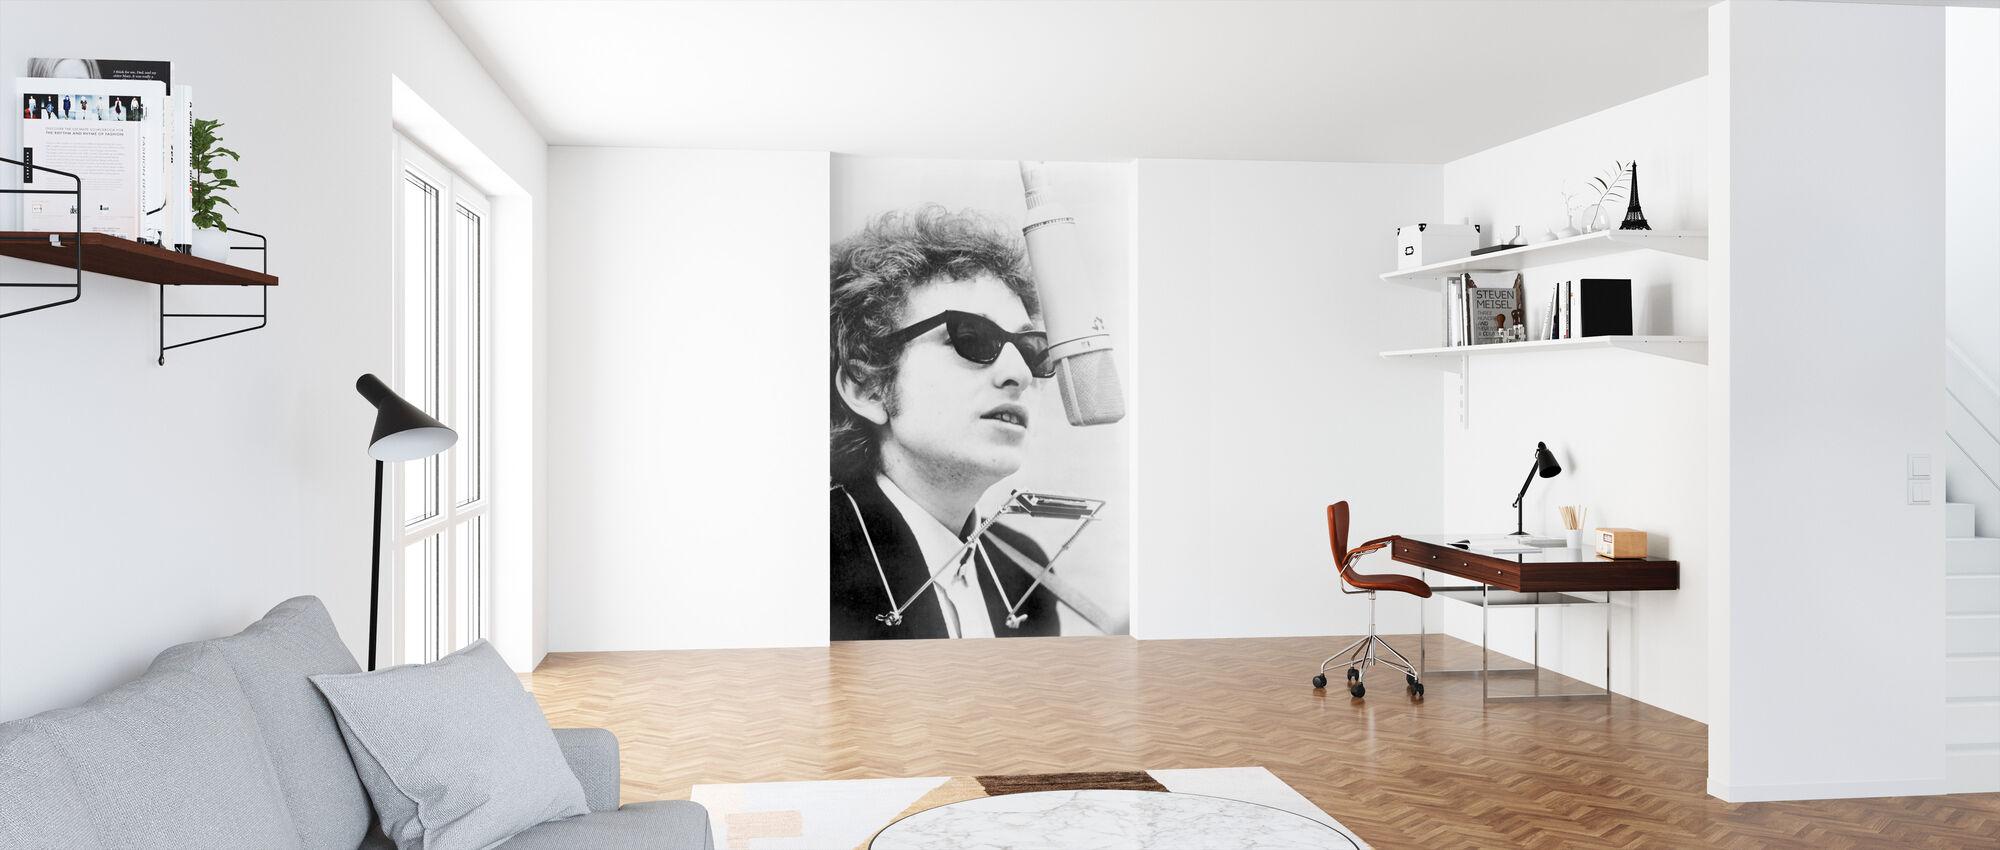 Blind Boy Grunt - Wallpaper - Office